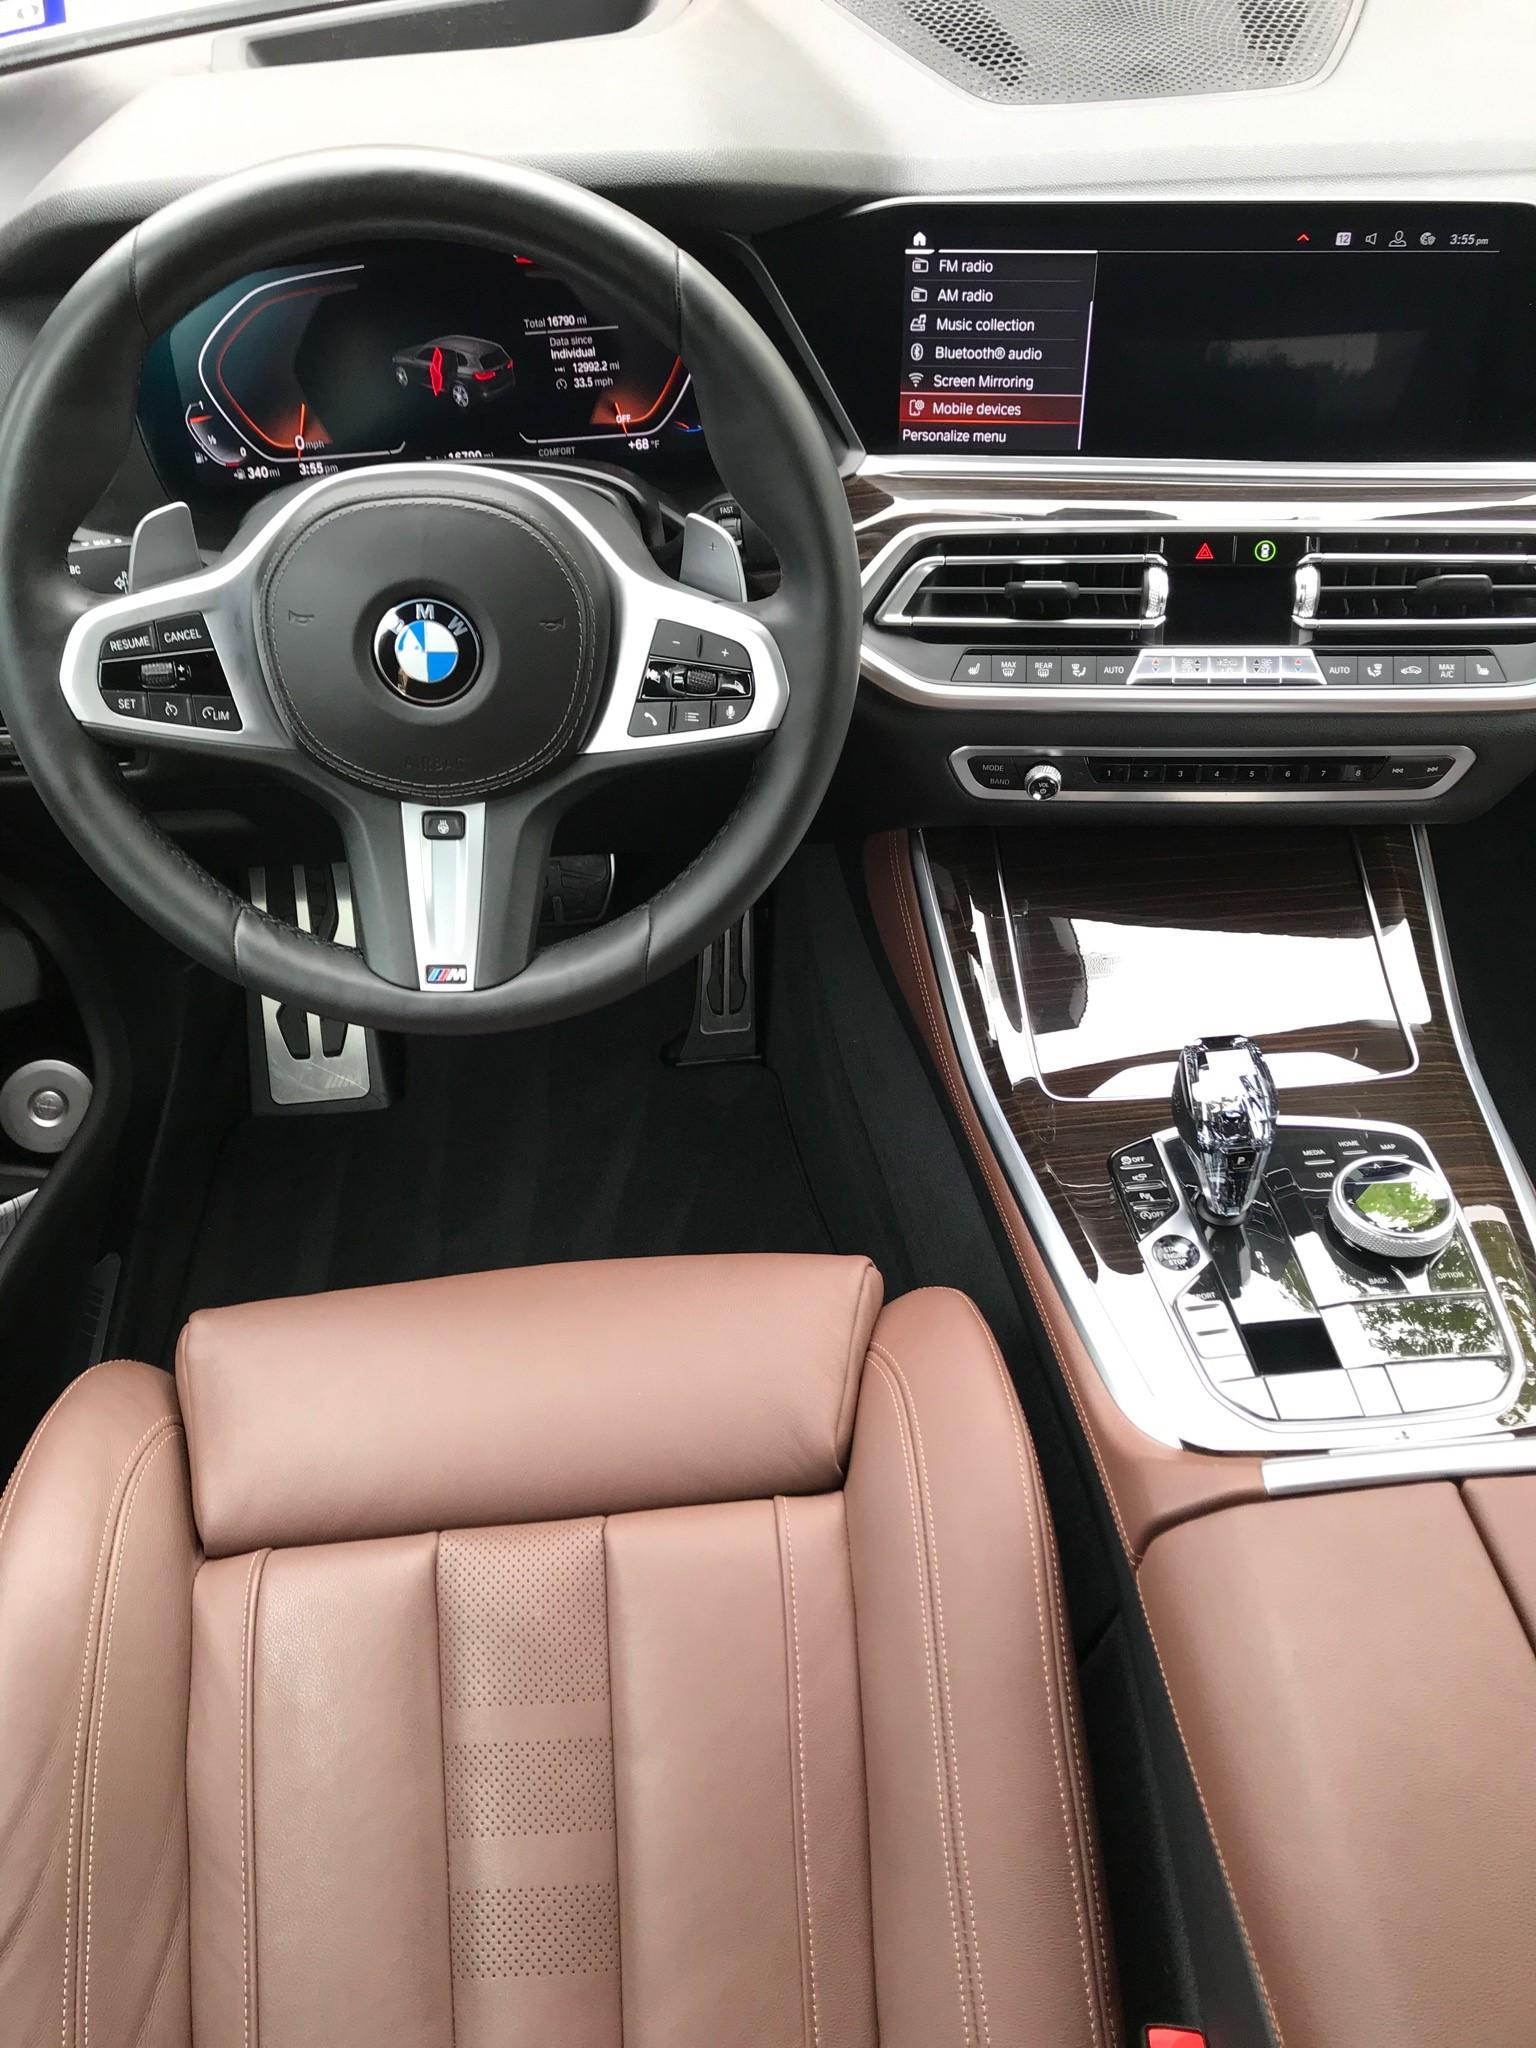 bmw interior.